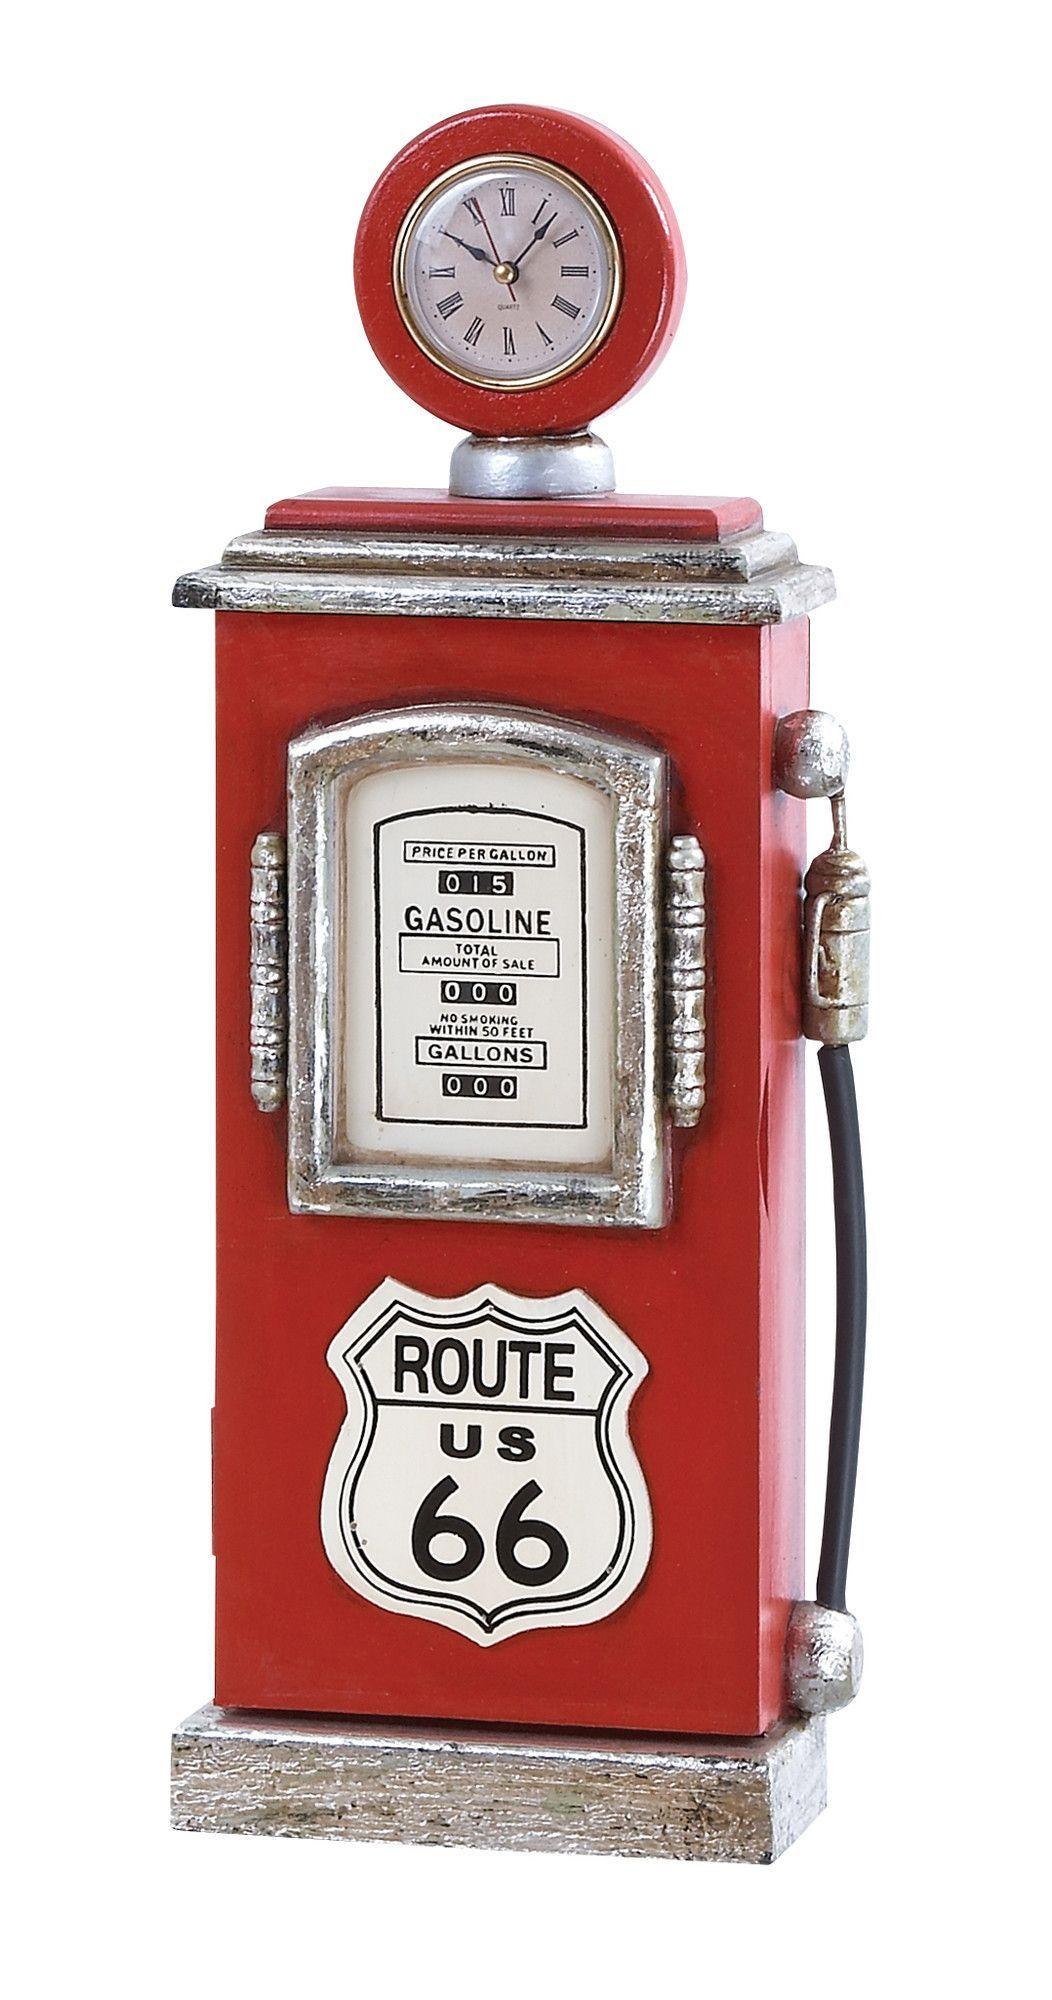 route 66 gas pump key holder products pinterest gas pumps